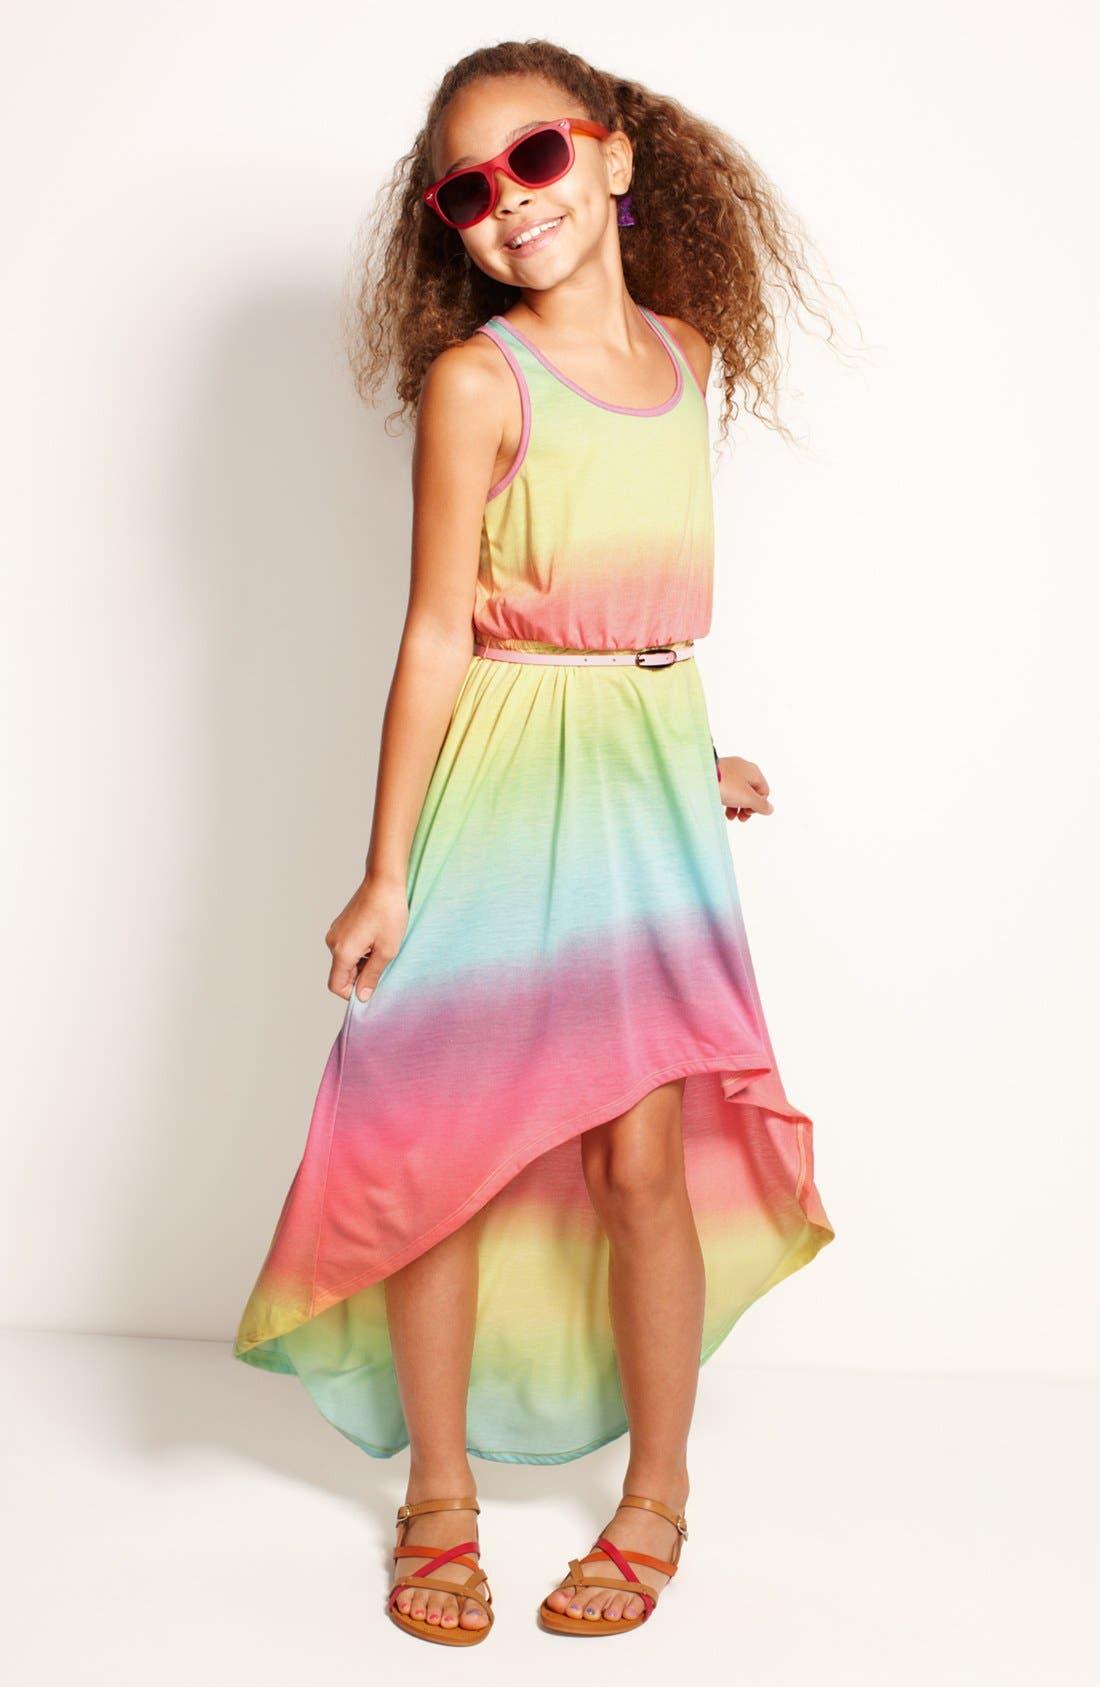 Alternate Image 1 Selected - Fire Tie Dye Dress & Accessories (Little Girls & Big Girls)